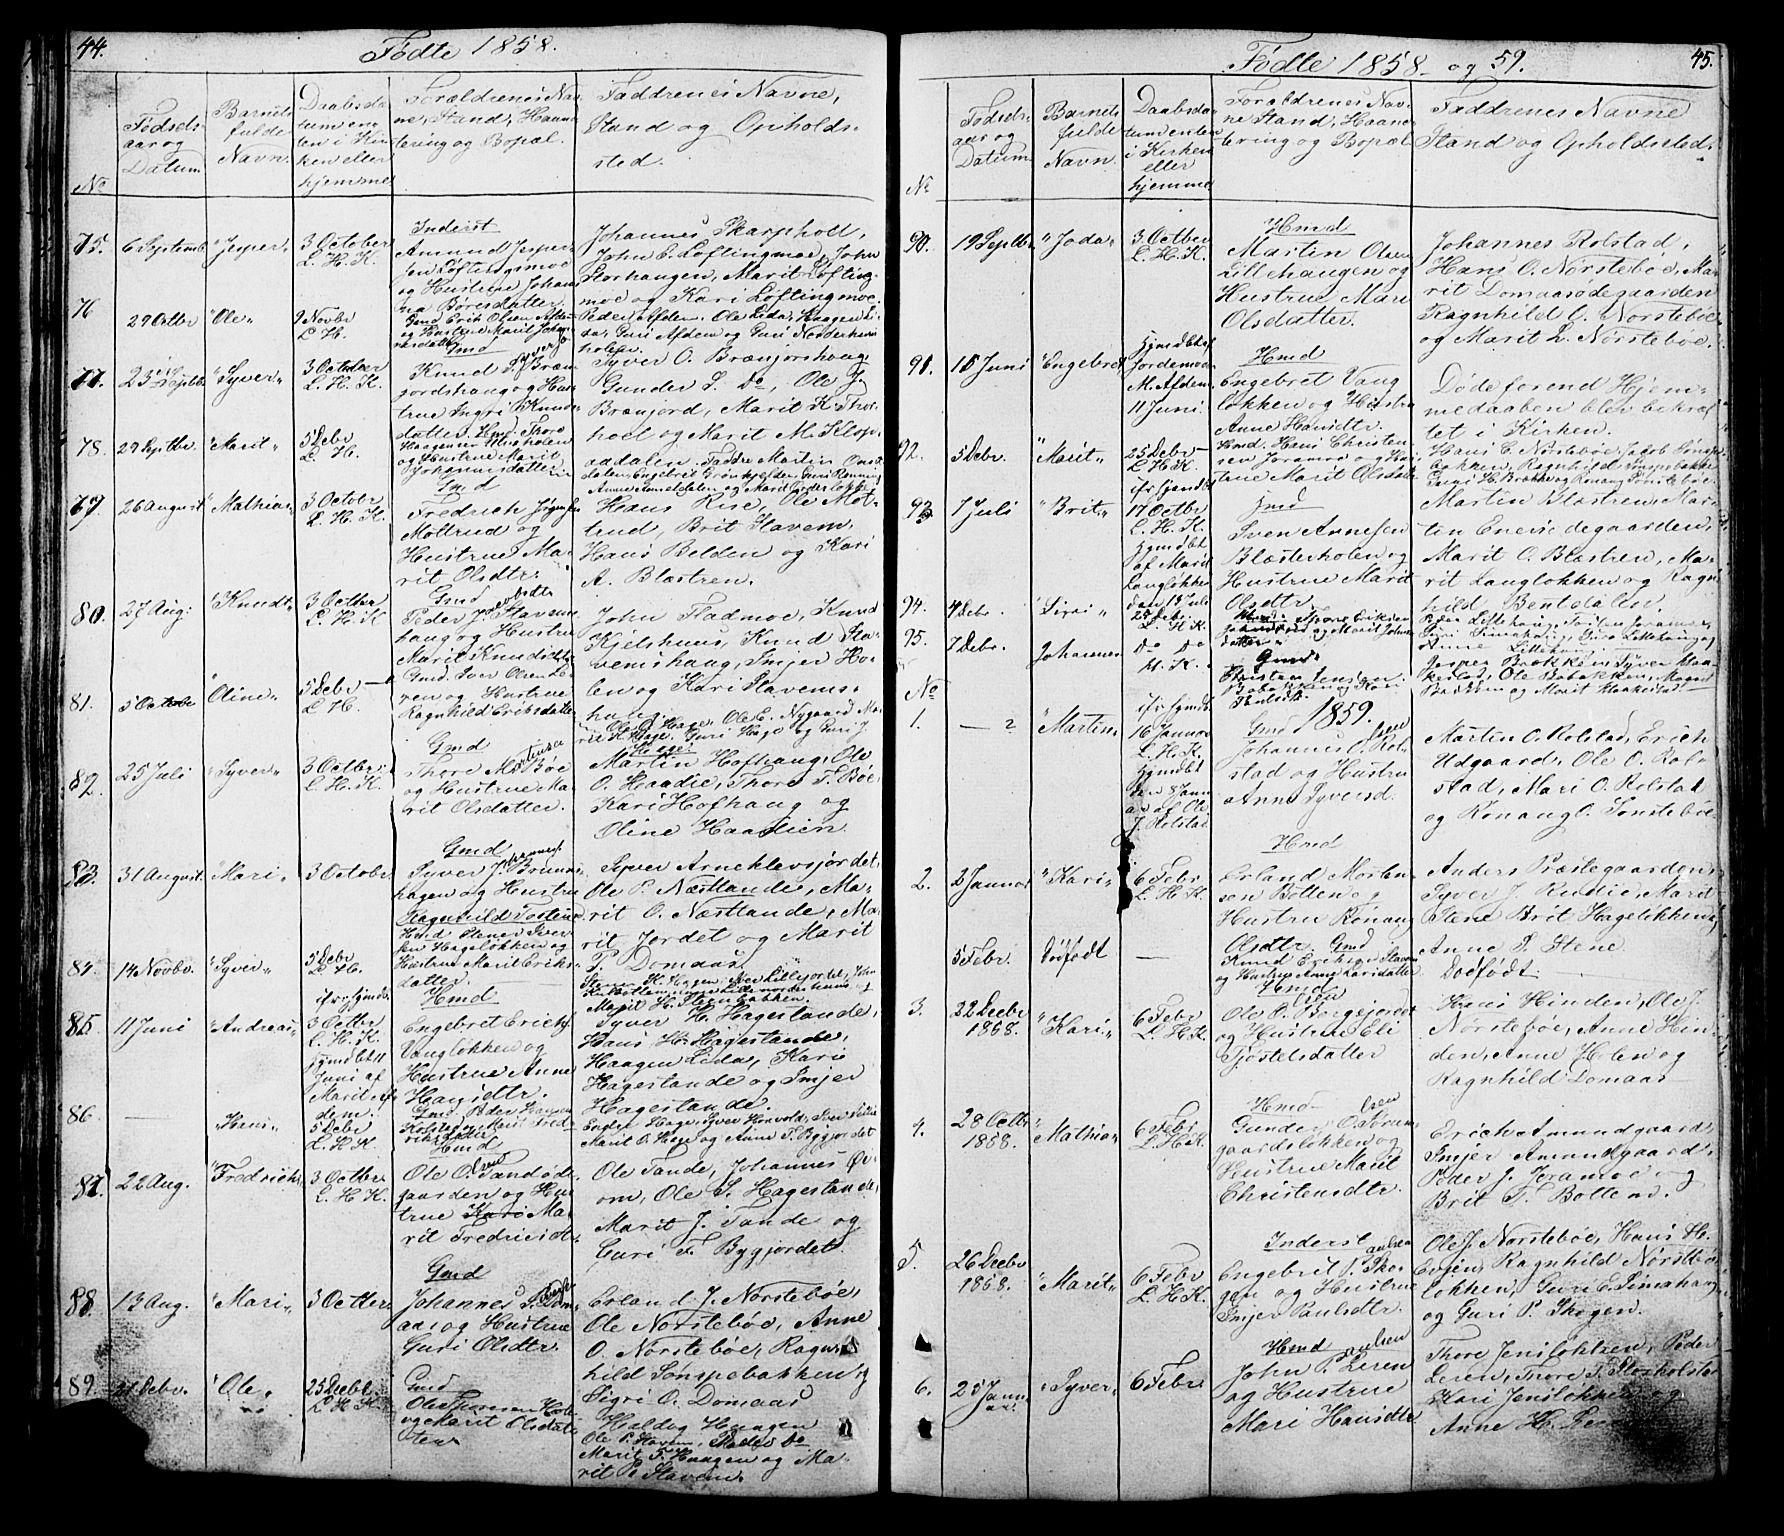 SAH, Lesja prestekontor, Klokkerbok nr. 5, 1850-1894, s. 44-45